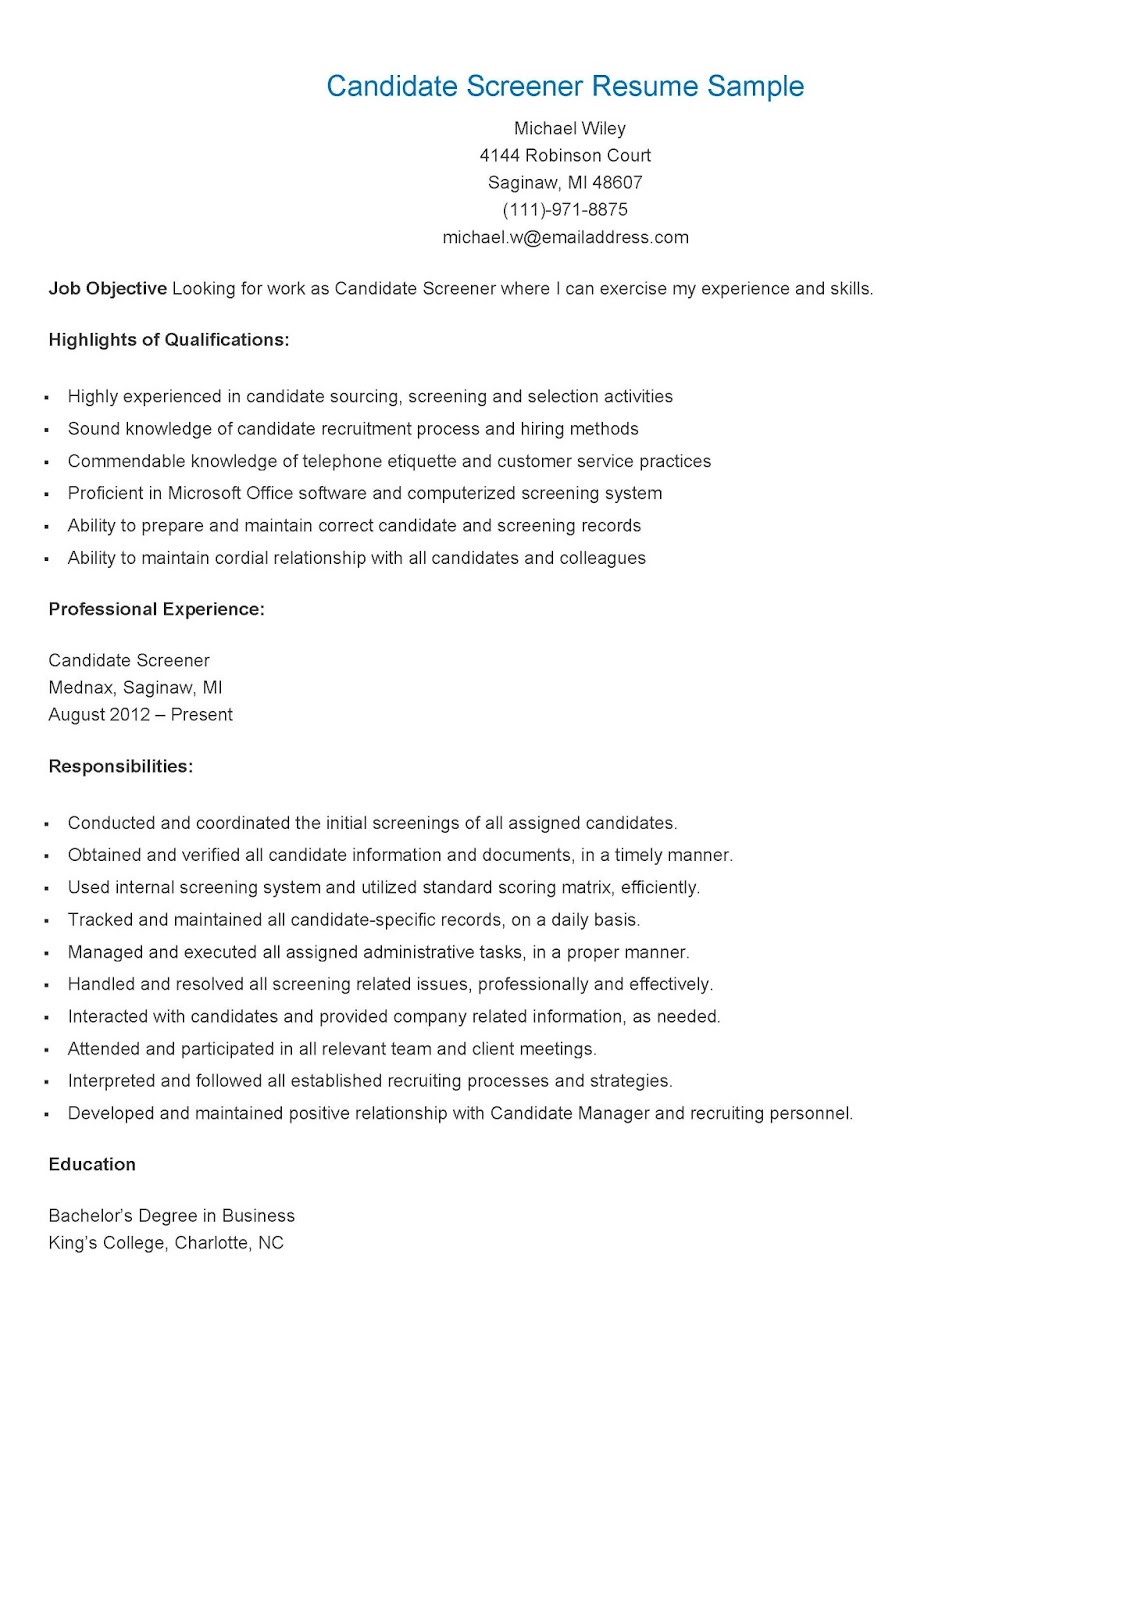 resume sles candidate screener resume sle